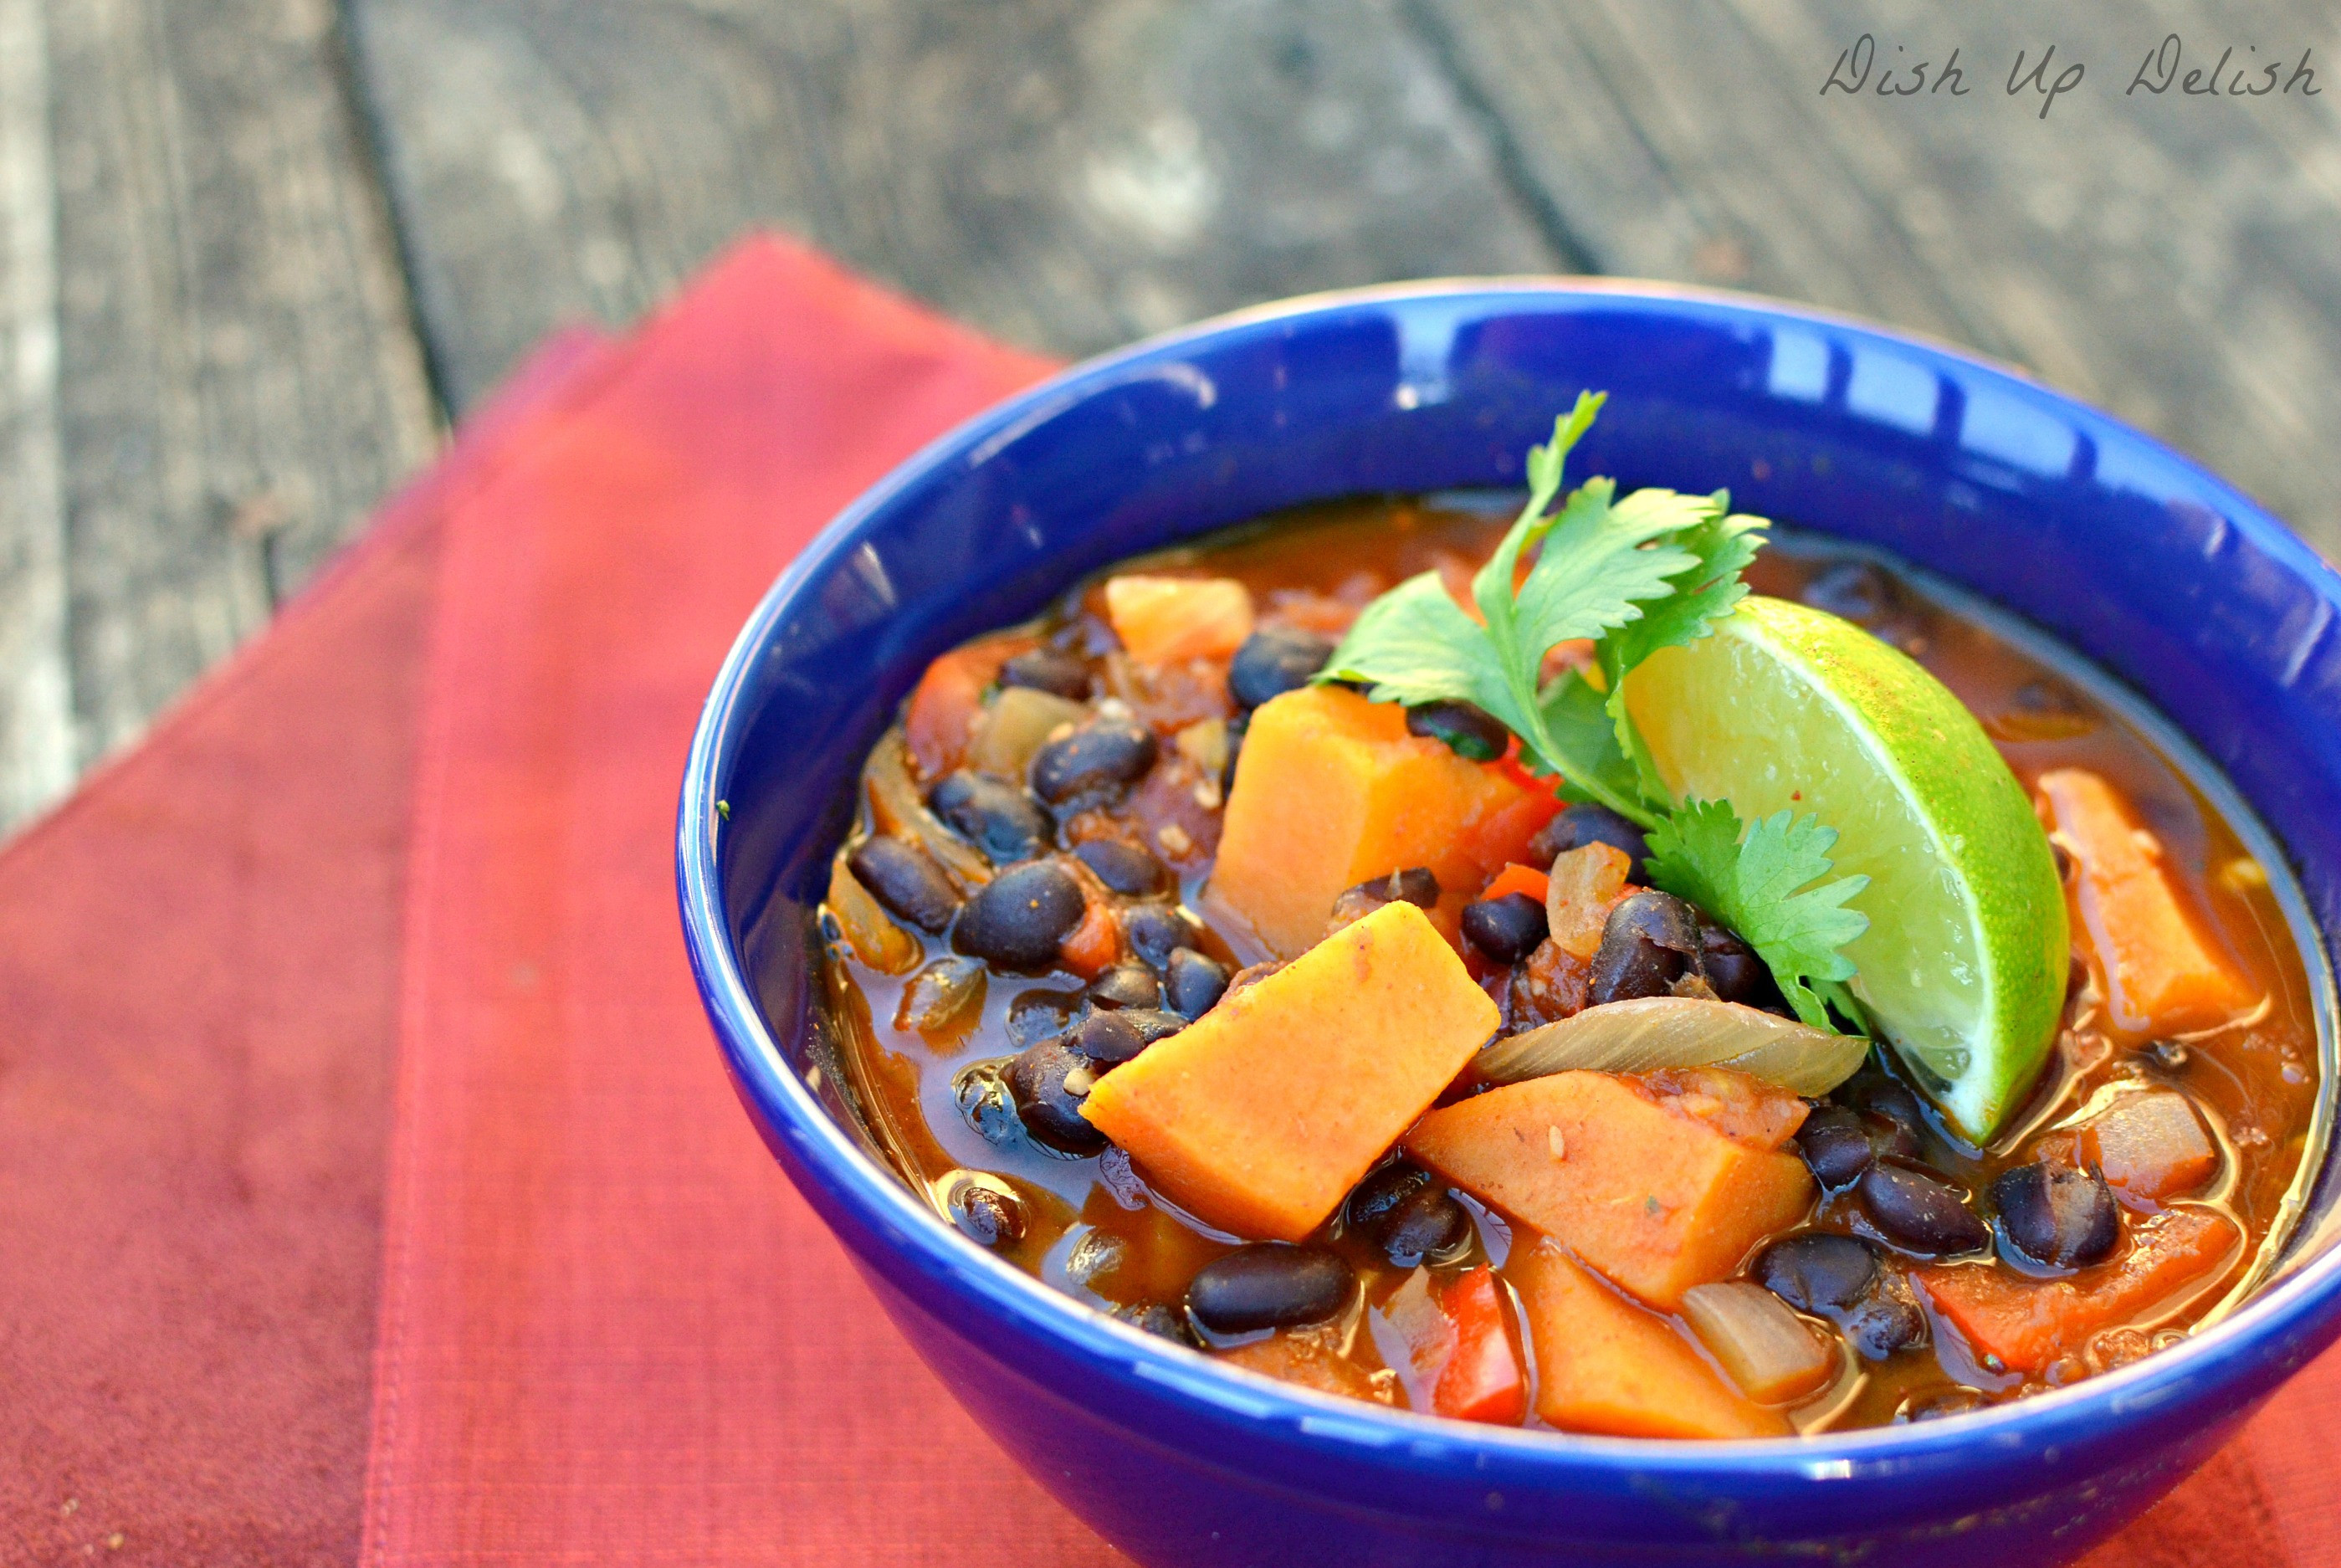 Black Bean Sweet Potato Chili  Smokey Black Bean & Sweet Potato Chili Dish Up Delish